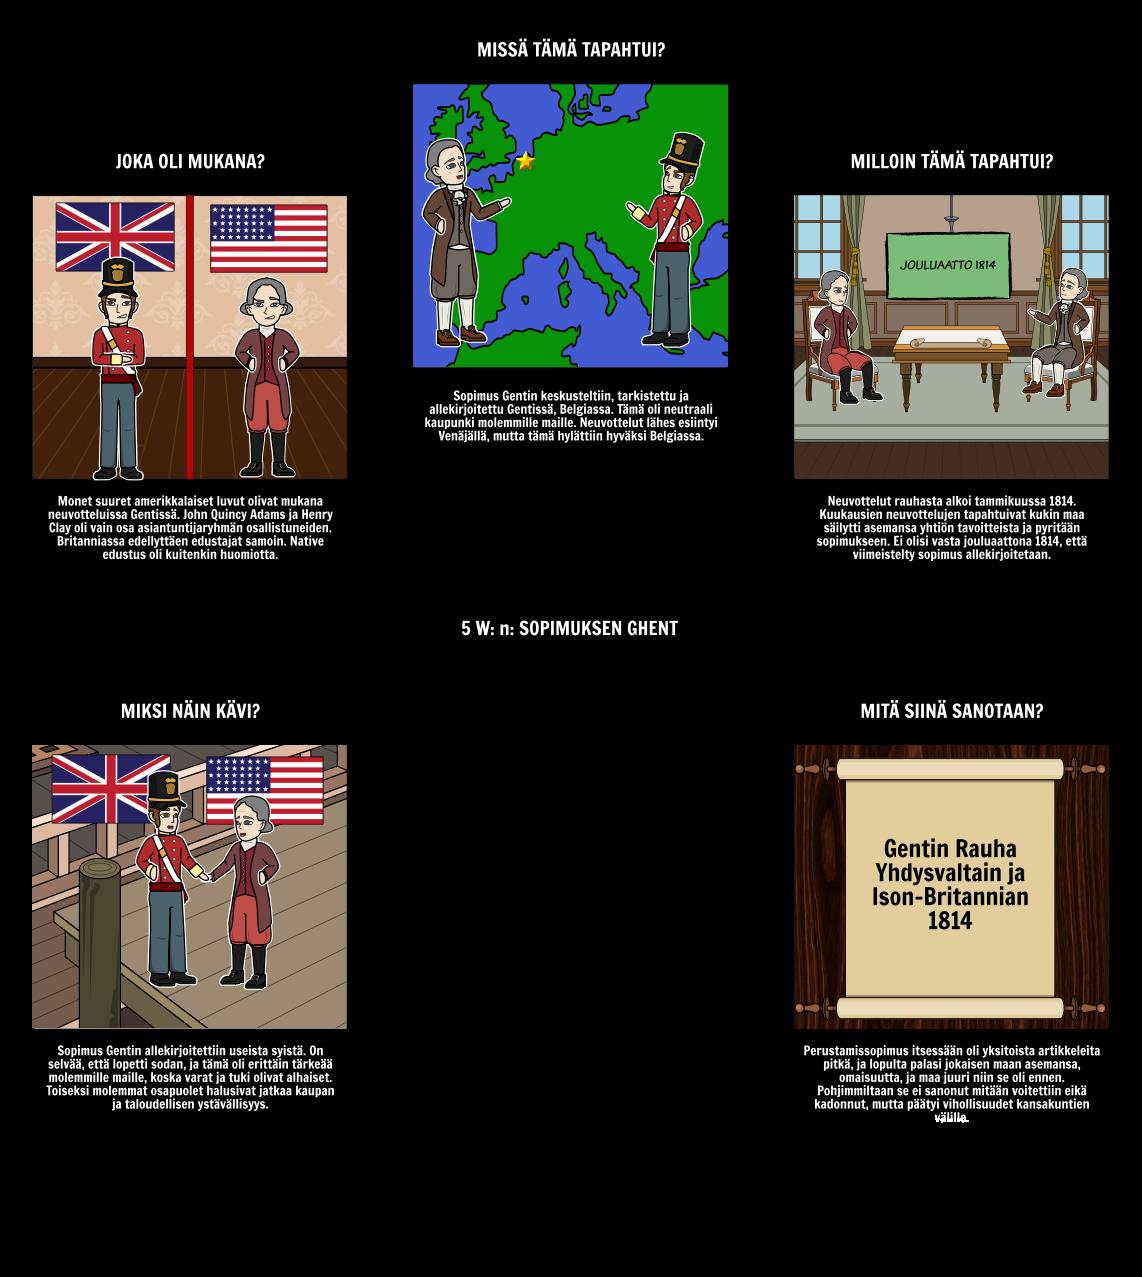 Sota 1812-5 Ws sopimuksen Gentin